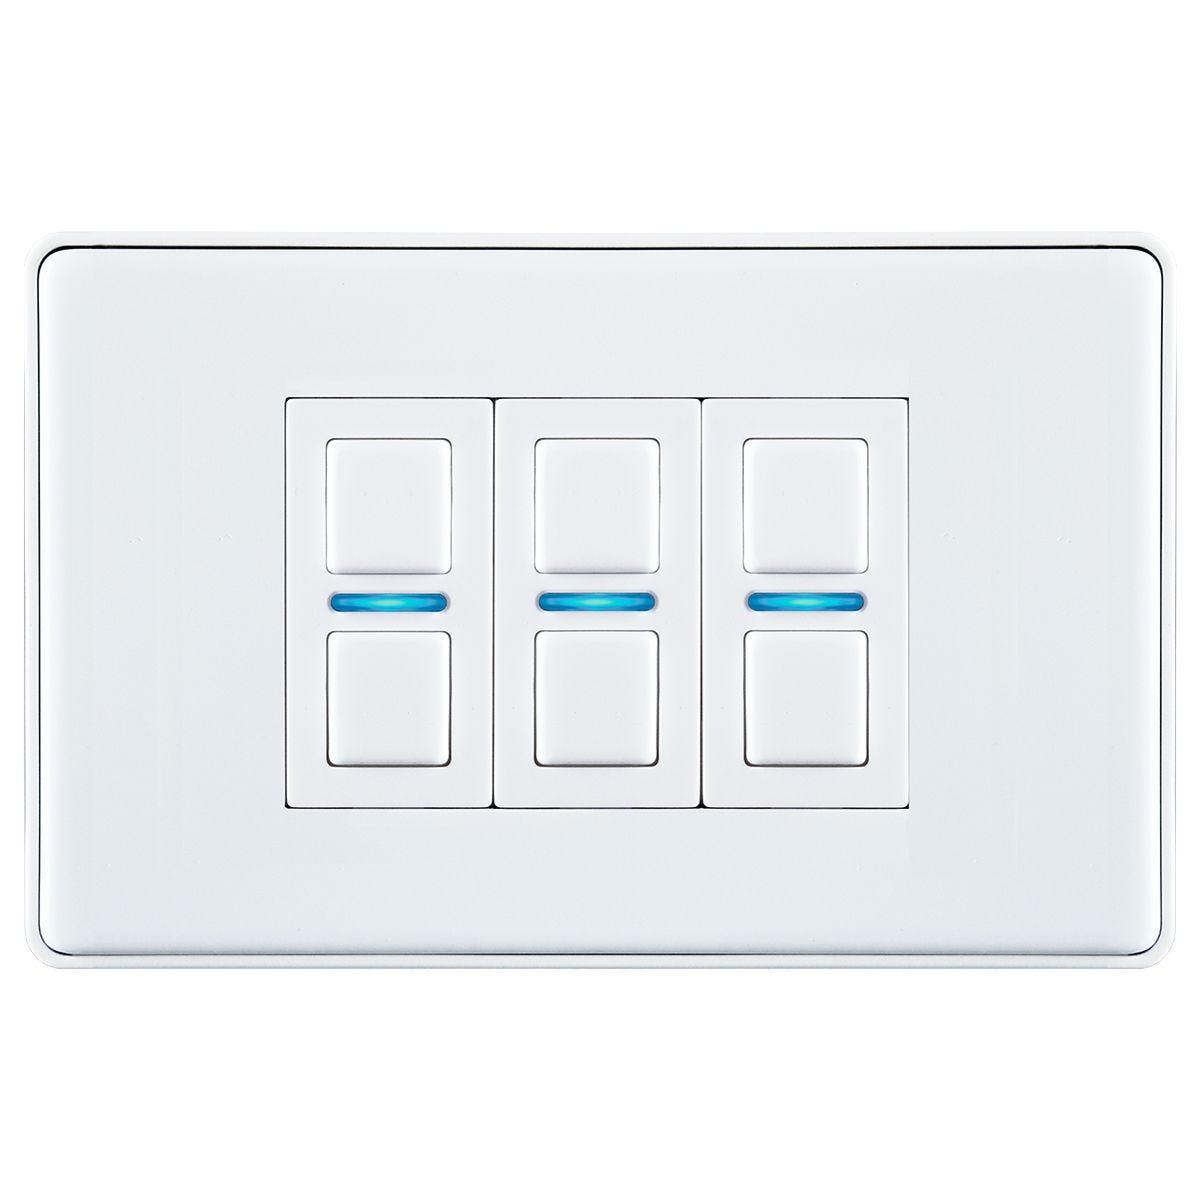 Lightwave Smart Series Dimmer (3 Gang) - White Metal